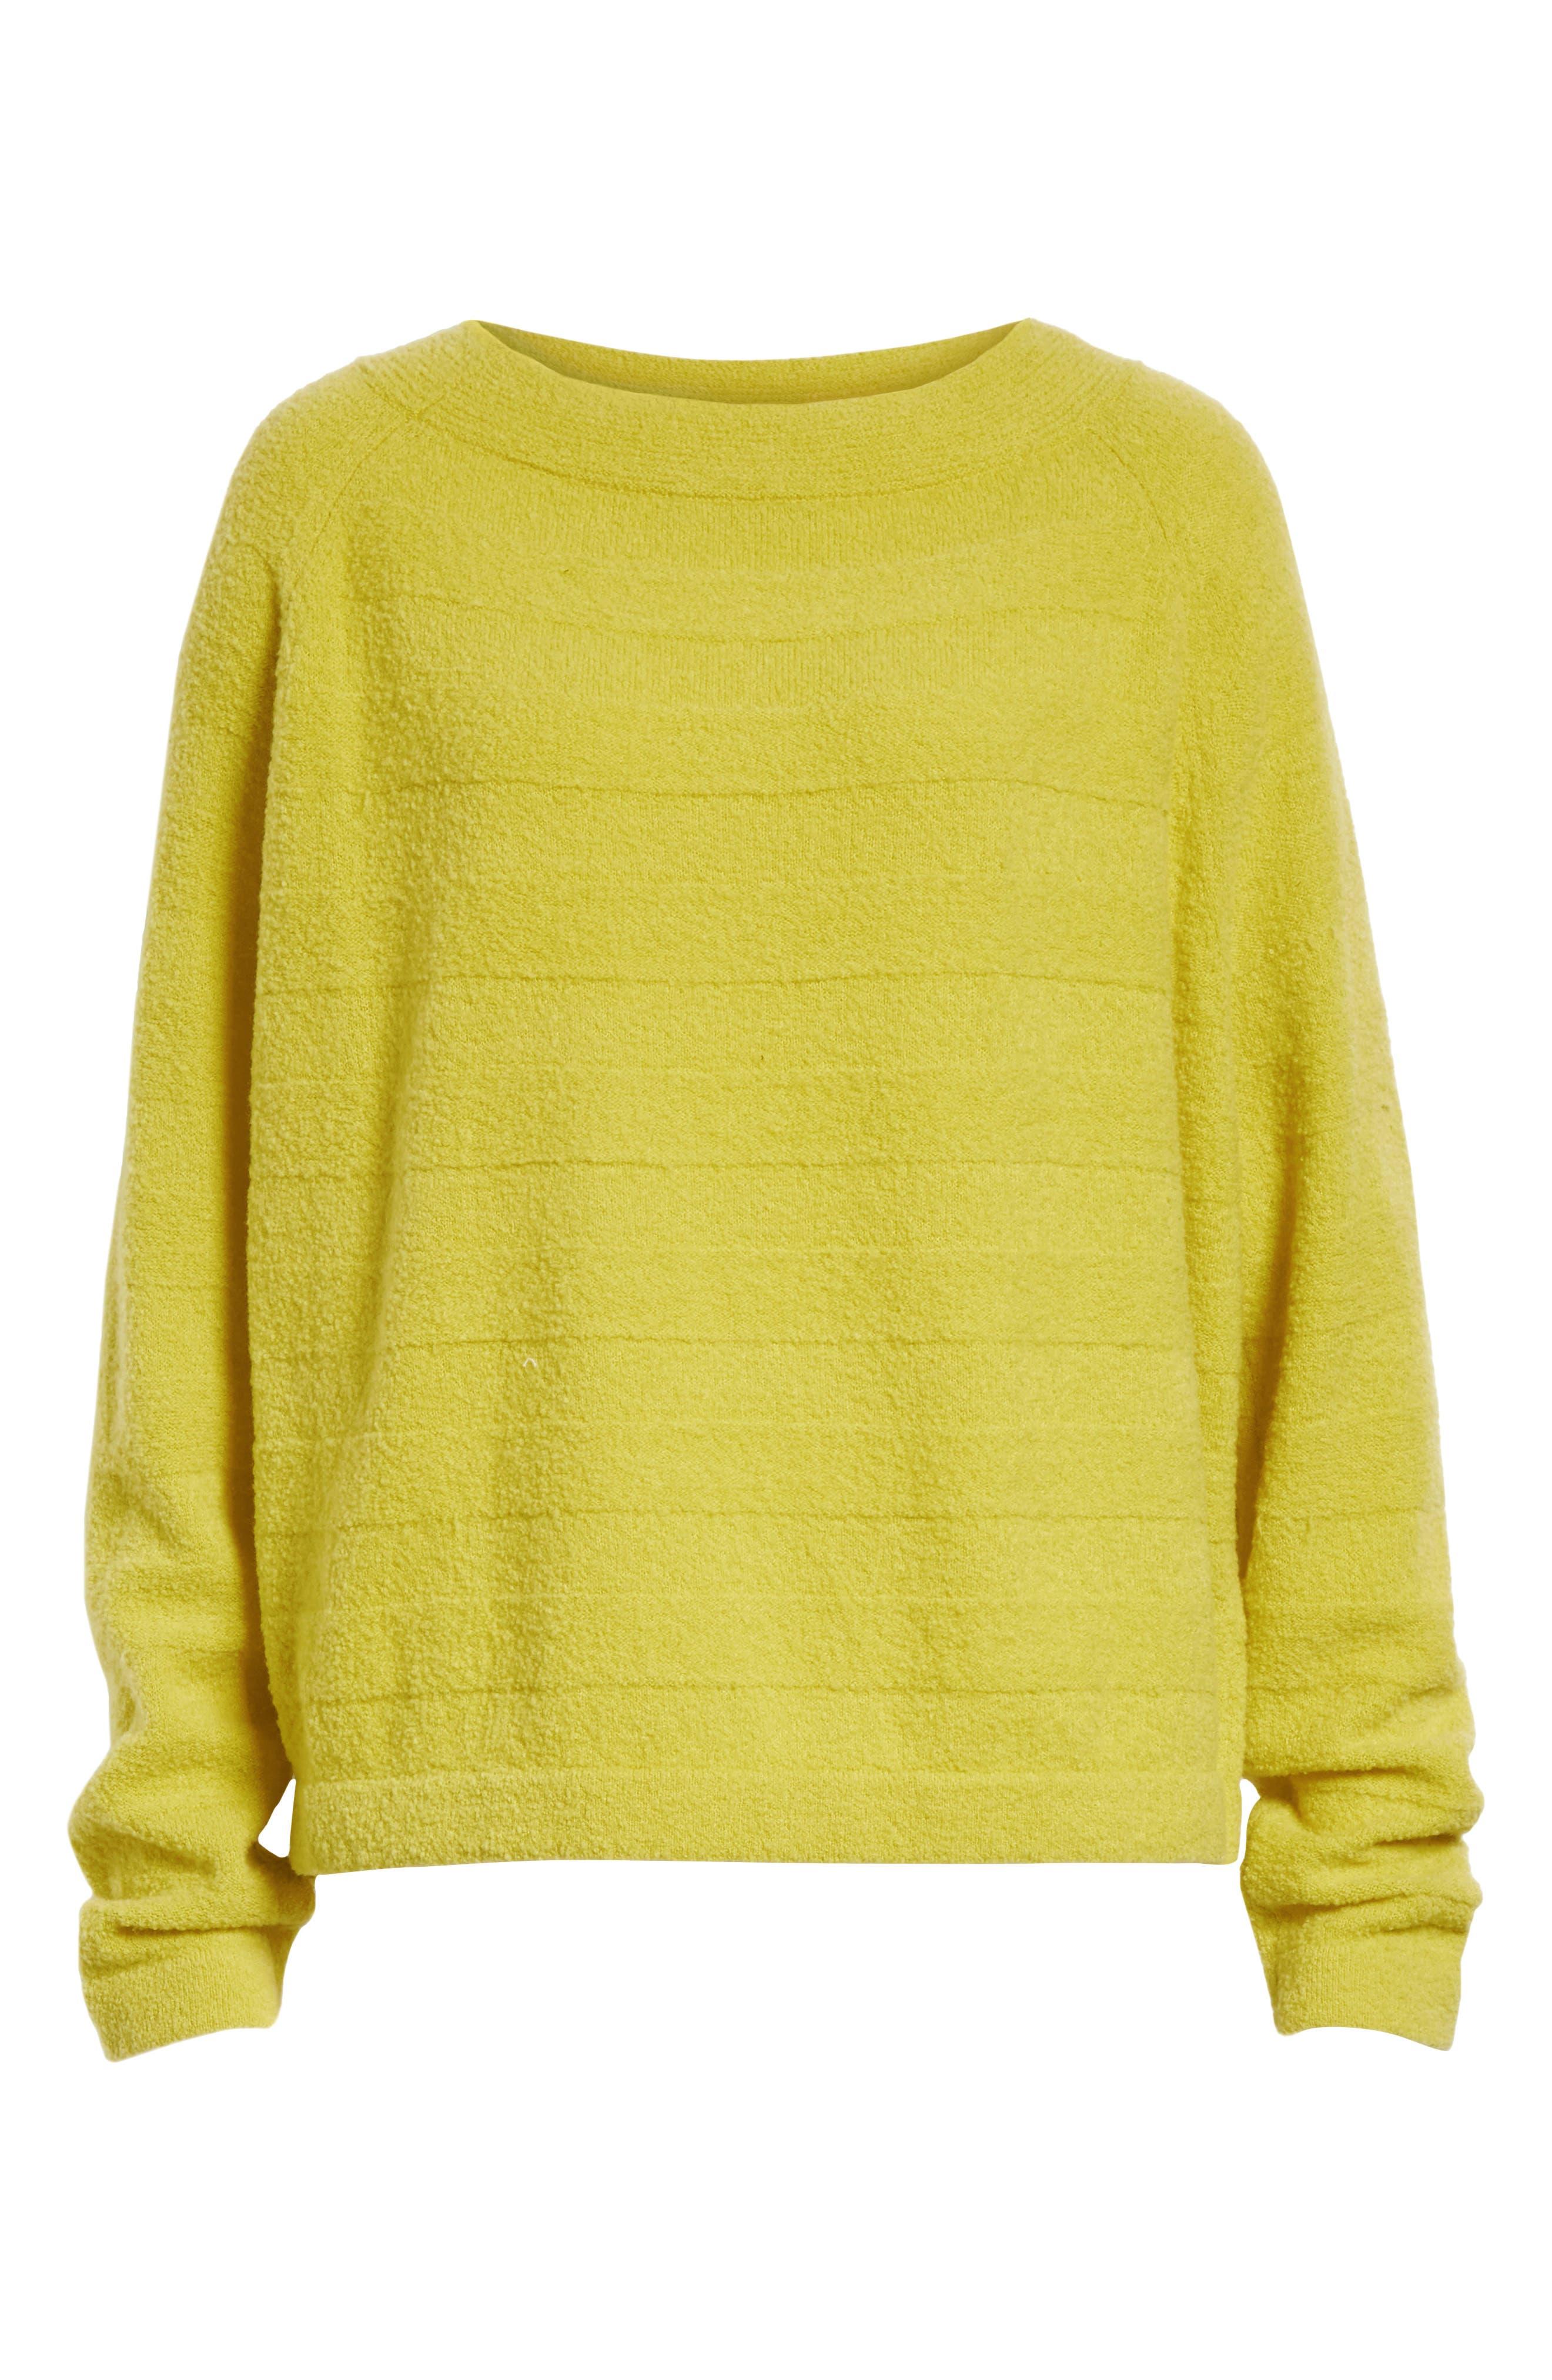 Merino Wool Blend Knit Sweater,                             Alternate thumbnail 6, color,                             Zest